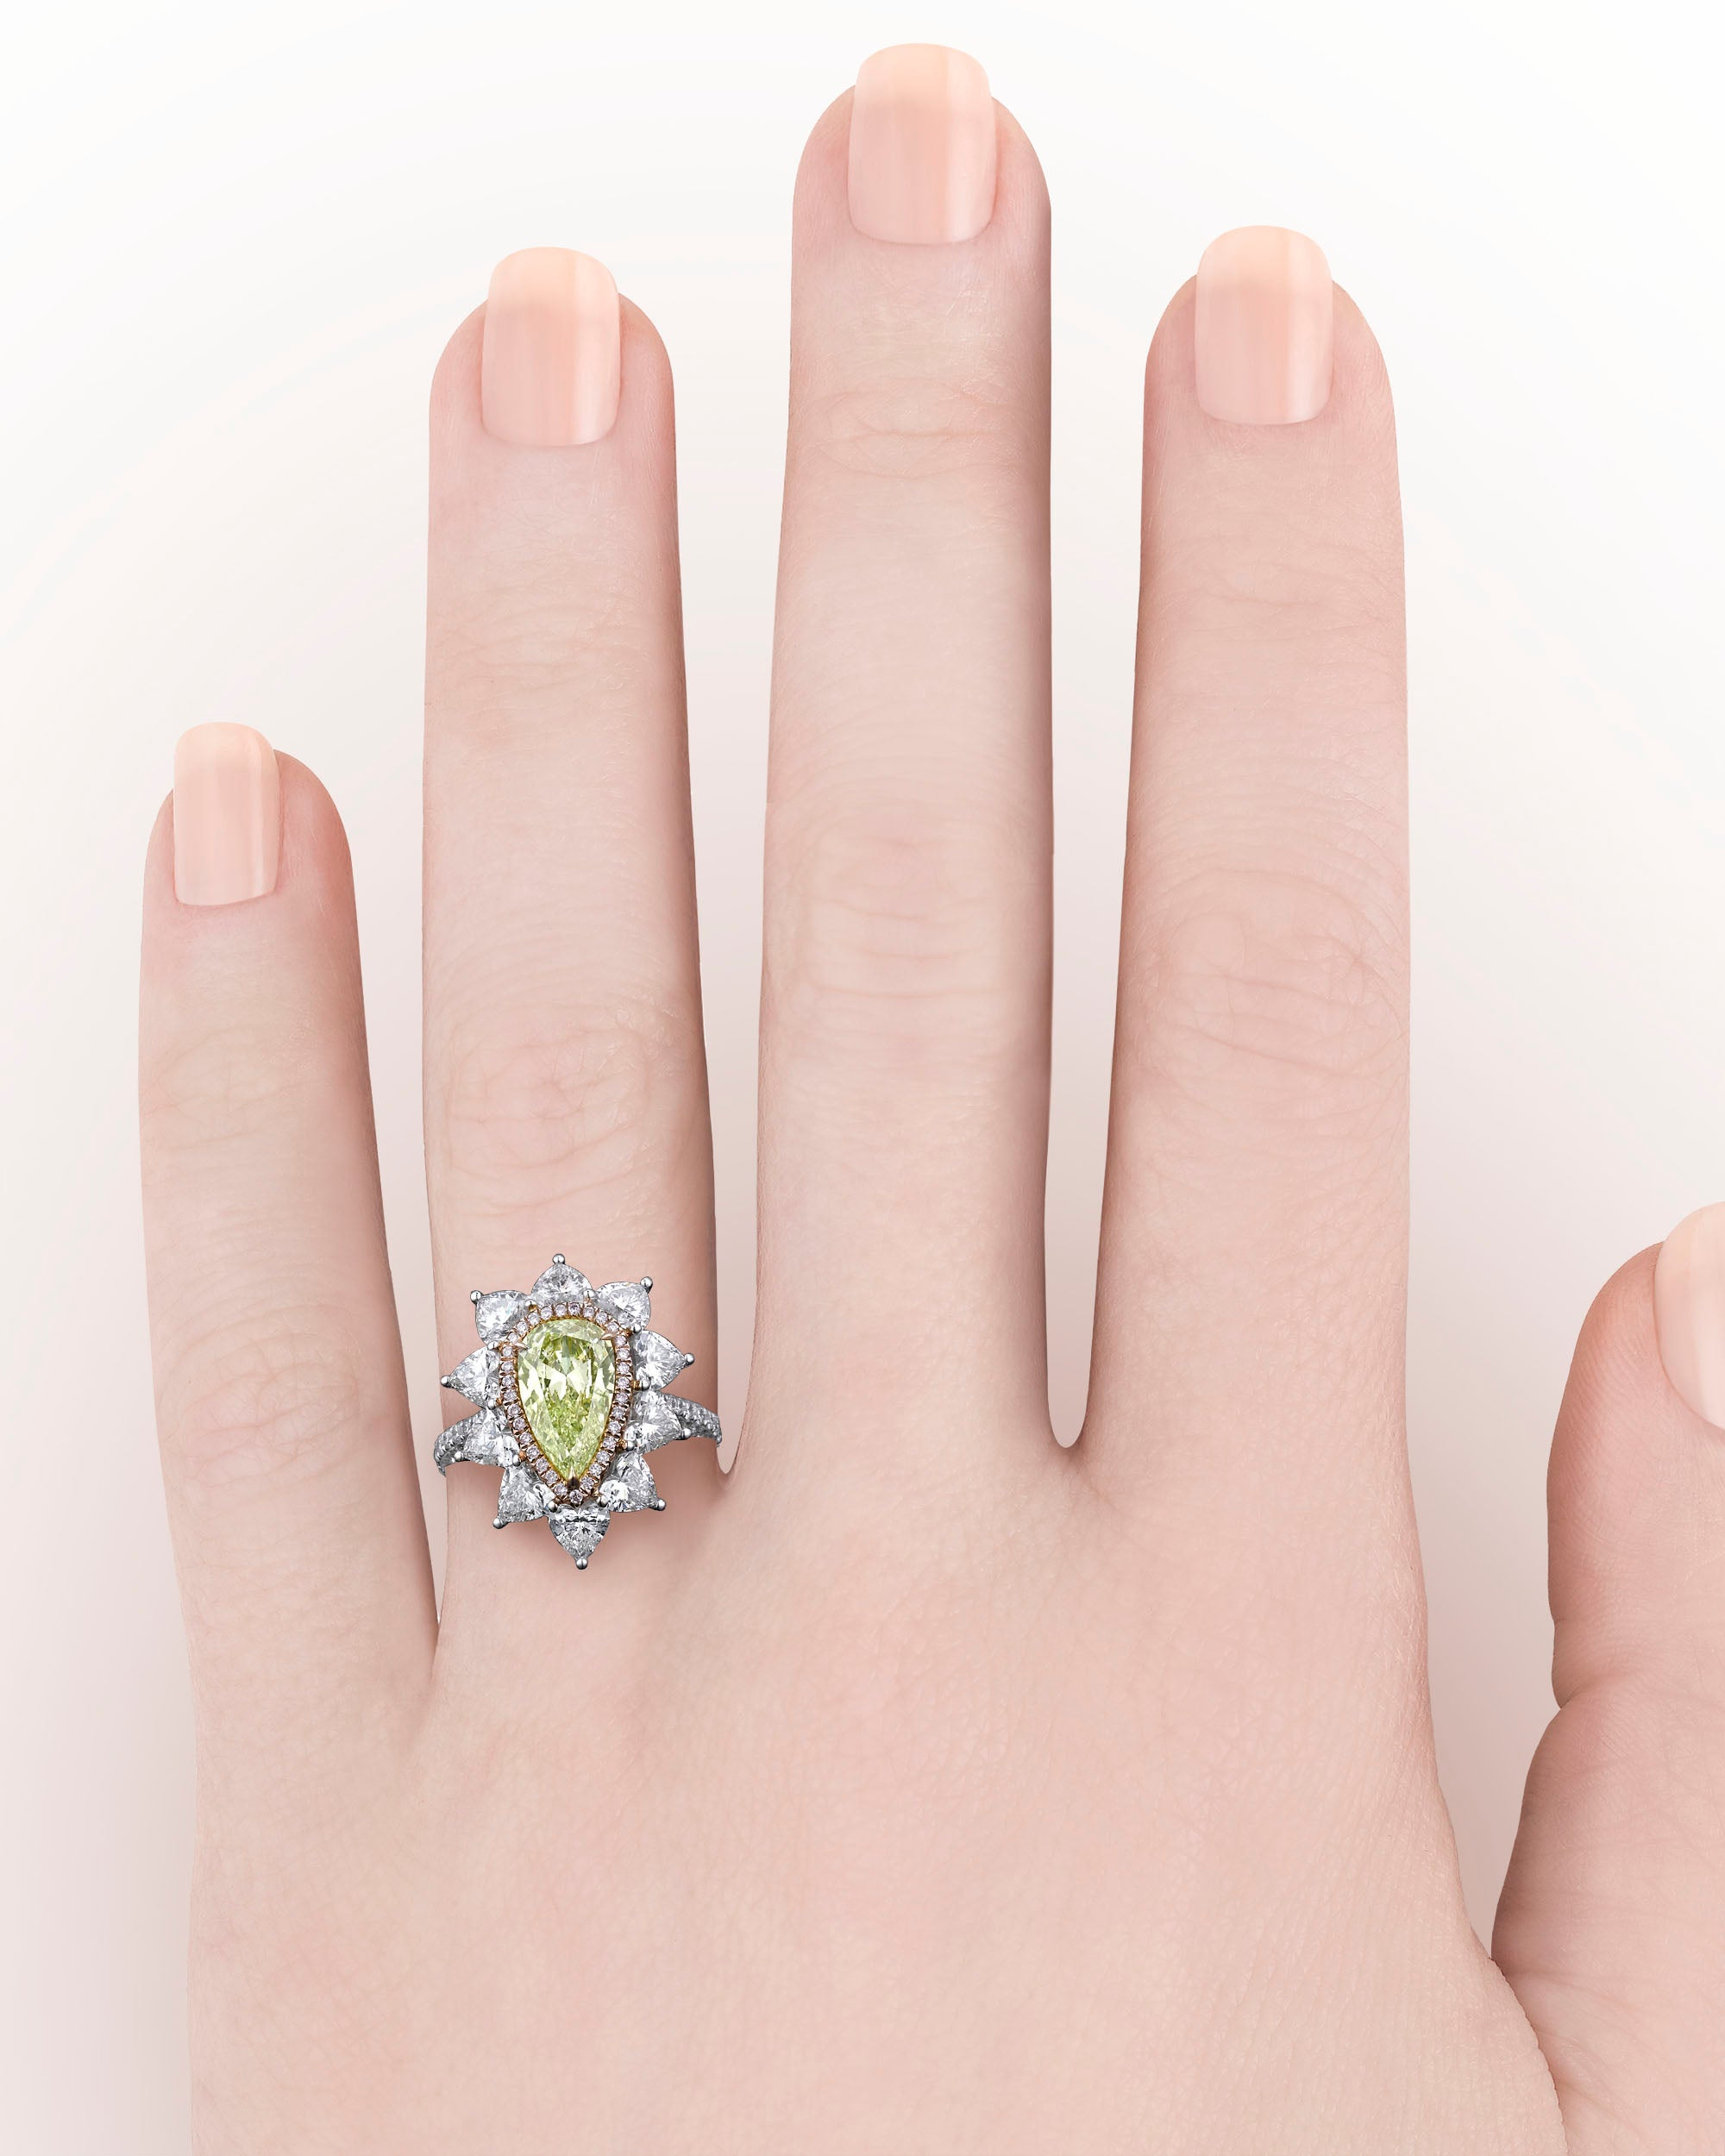 Fancy Intense Yellow Green Diamond Ring, 1.72 Carat For Sale at 1stdibs